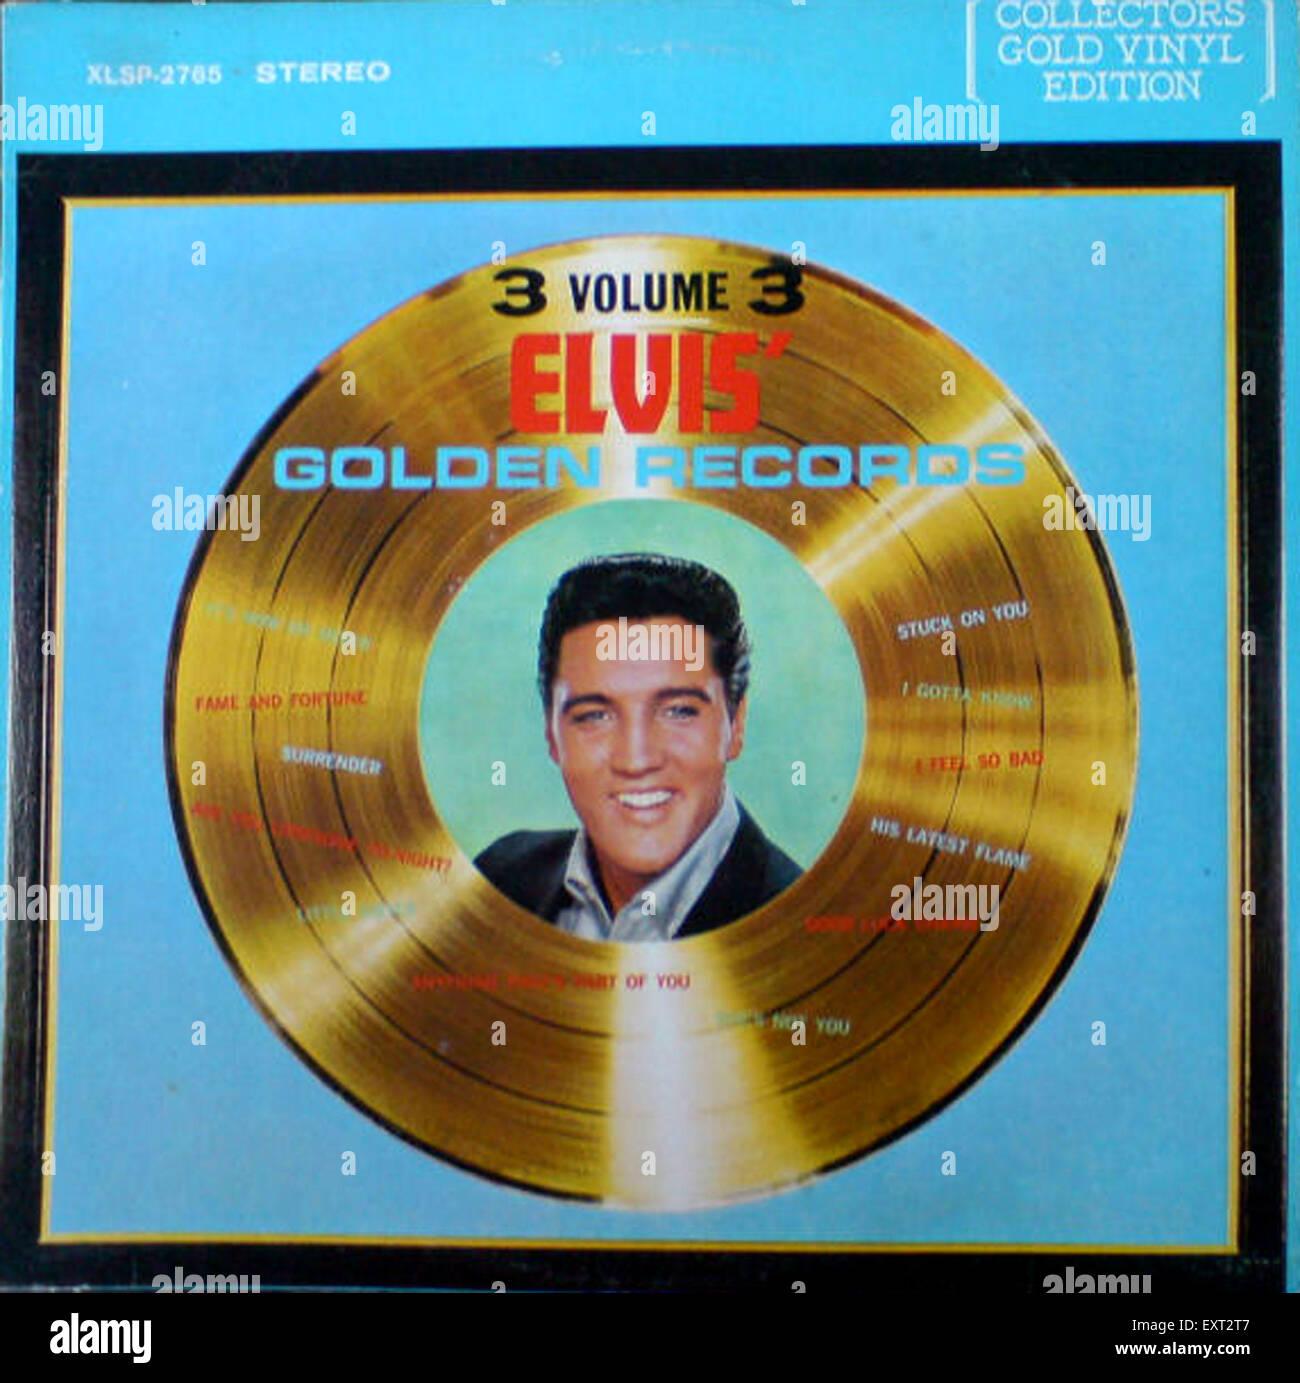 1960s USA Elvis Record Sleeve Album Cover - Stock Image